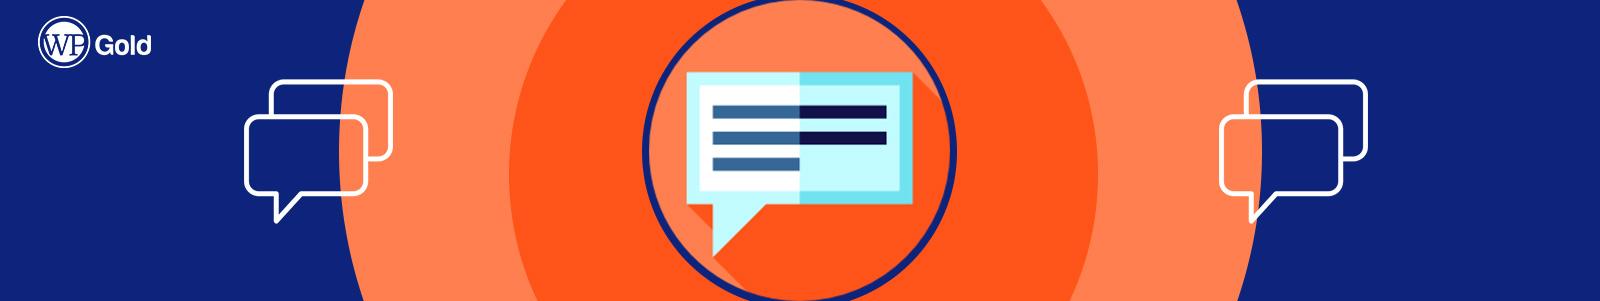 Как управлять комментариями на на WordPress-сайте